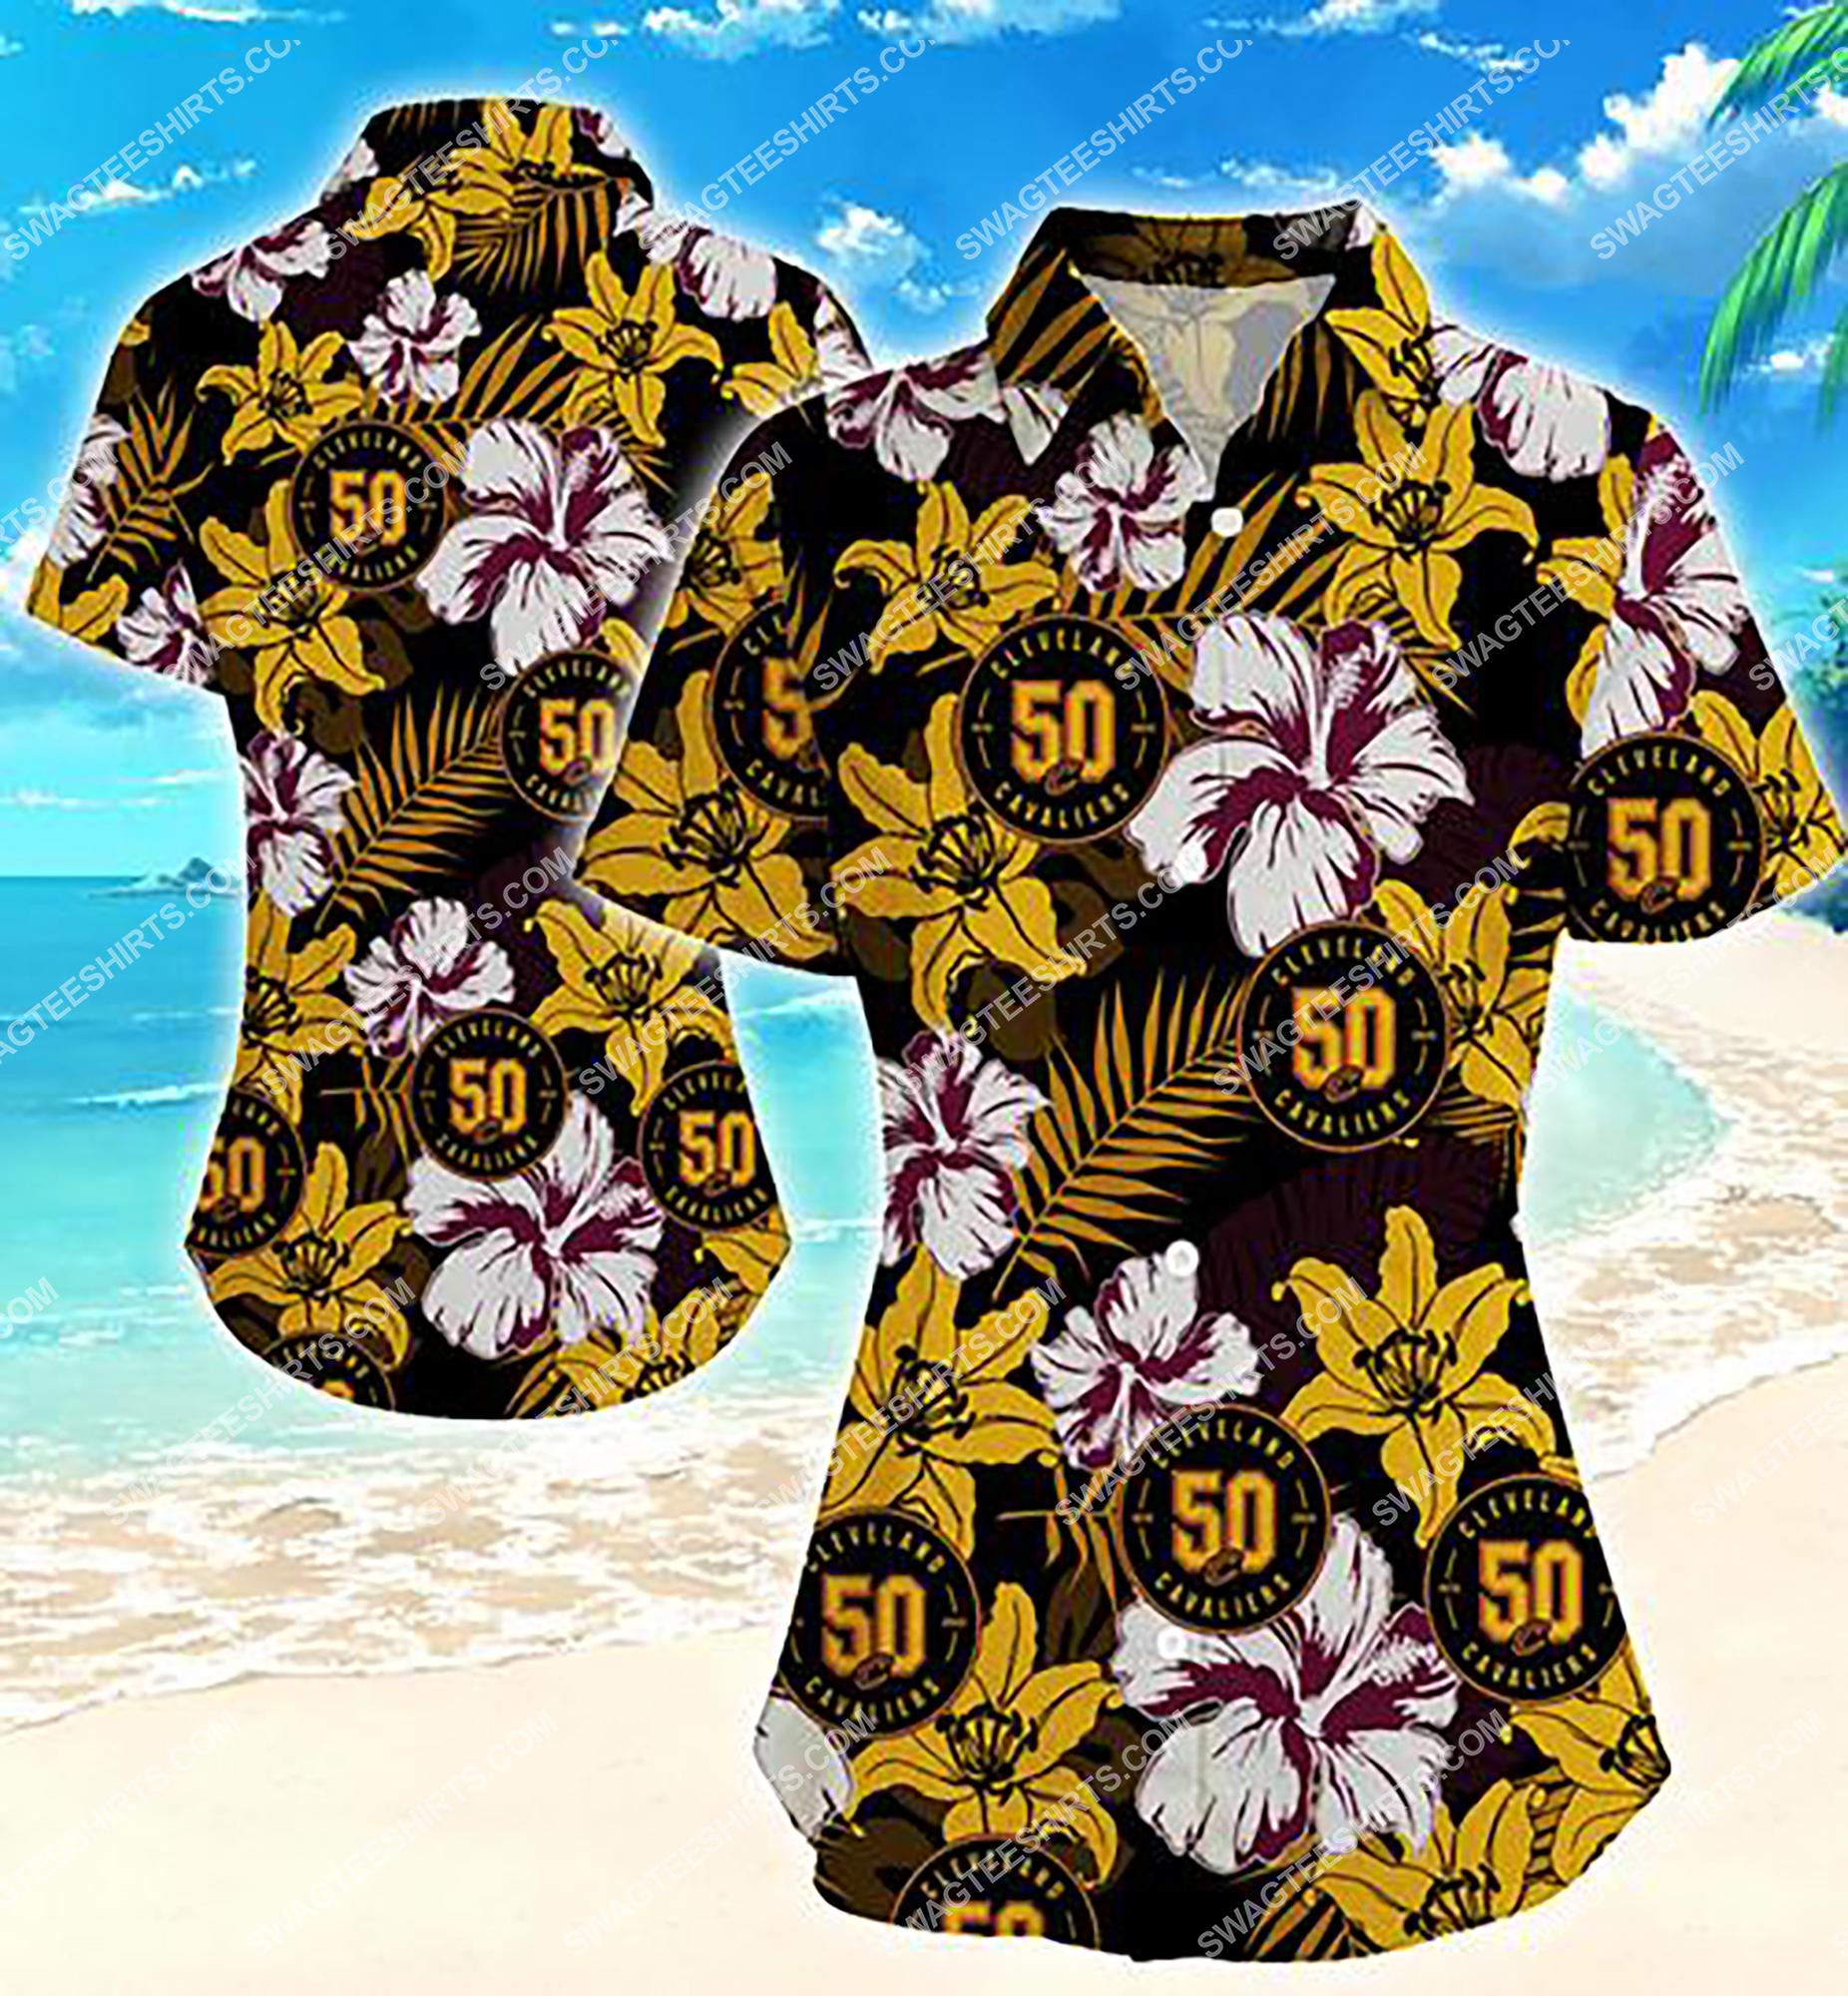 national basketball association cleveland cavaliers team hawaiian shirt 2 - Copy (3)